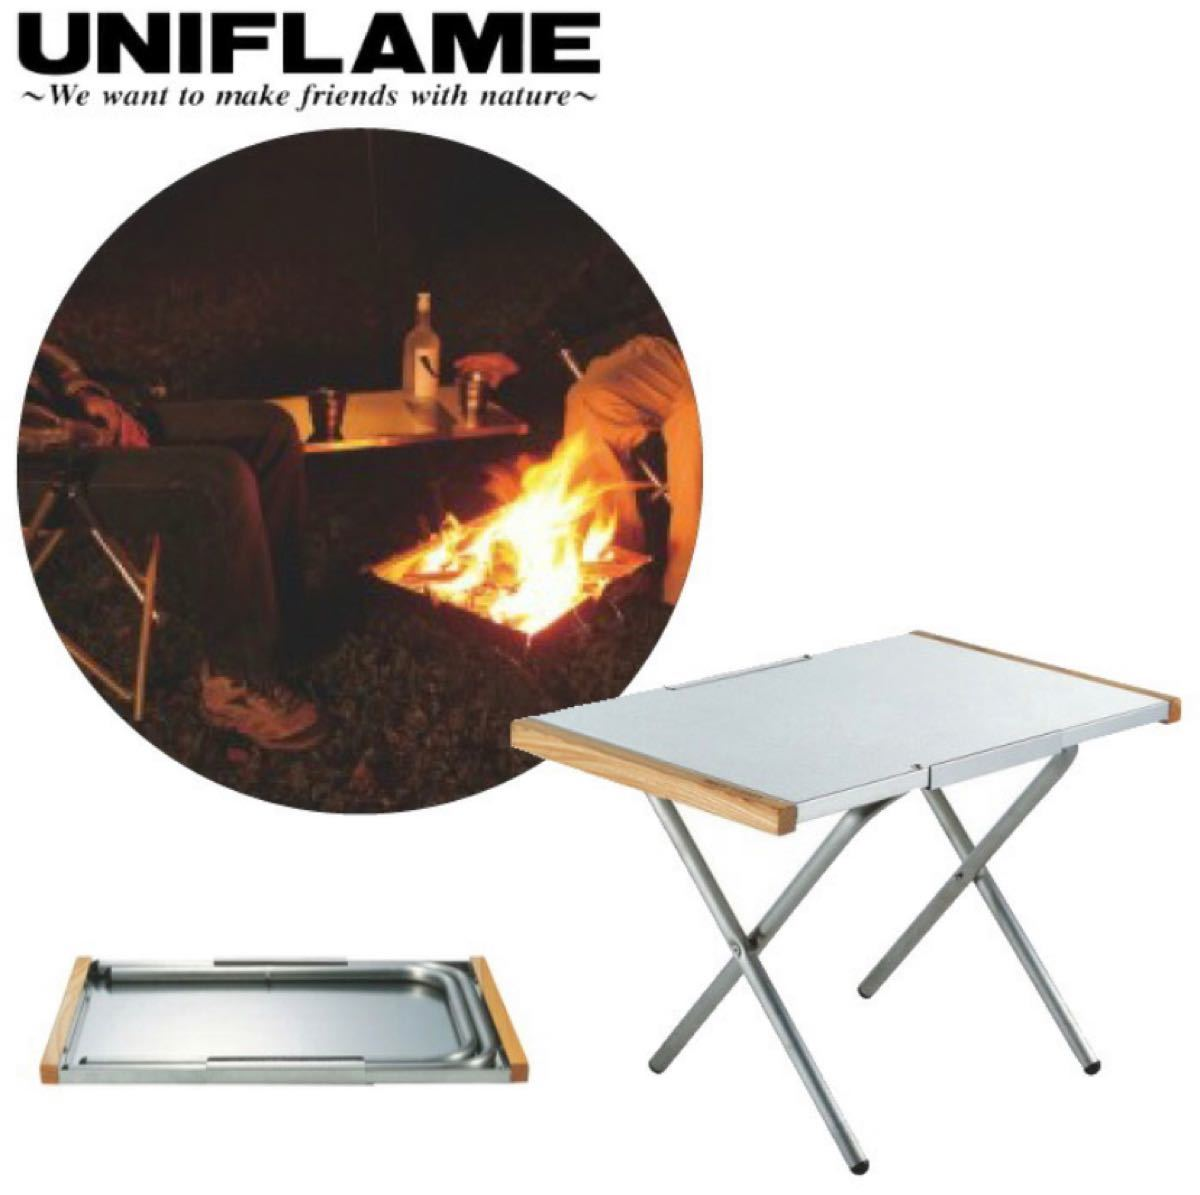 UNIFLAME ユニフレーム ファイアグリル 2点セット (焚き火テーブル付き) 焚き火 キャンプ BBQ バーベキュー